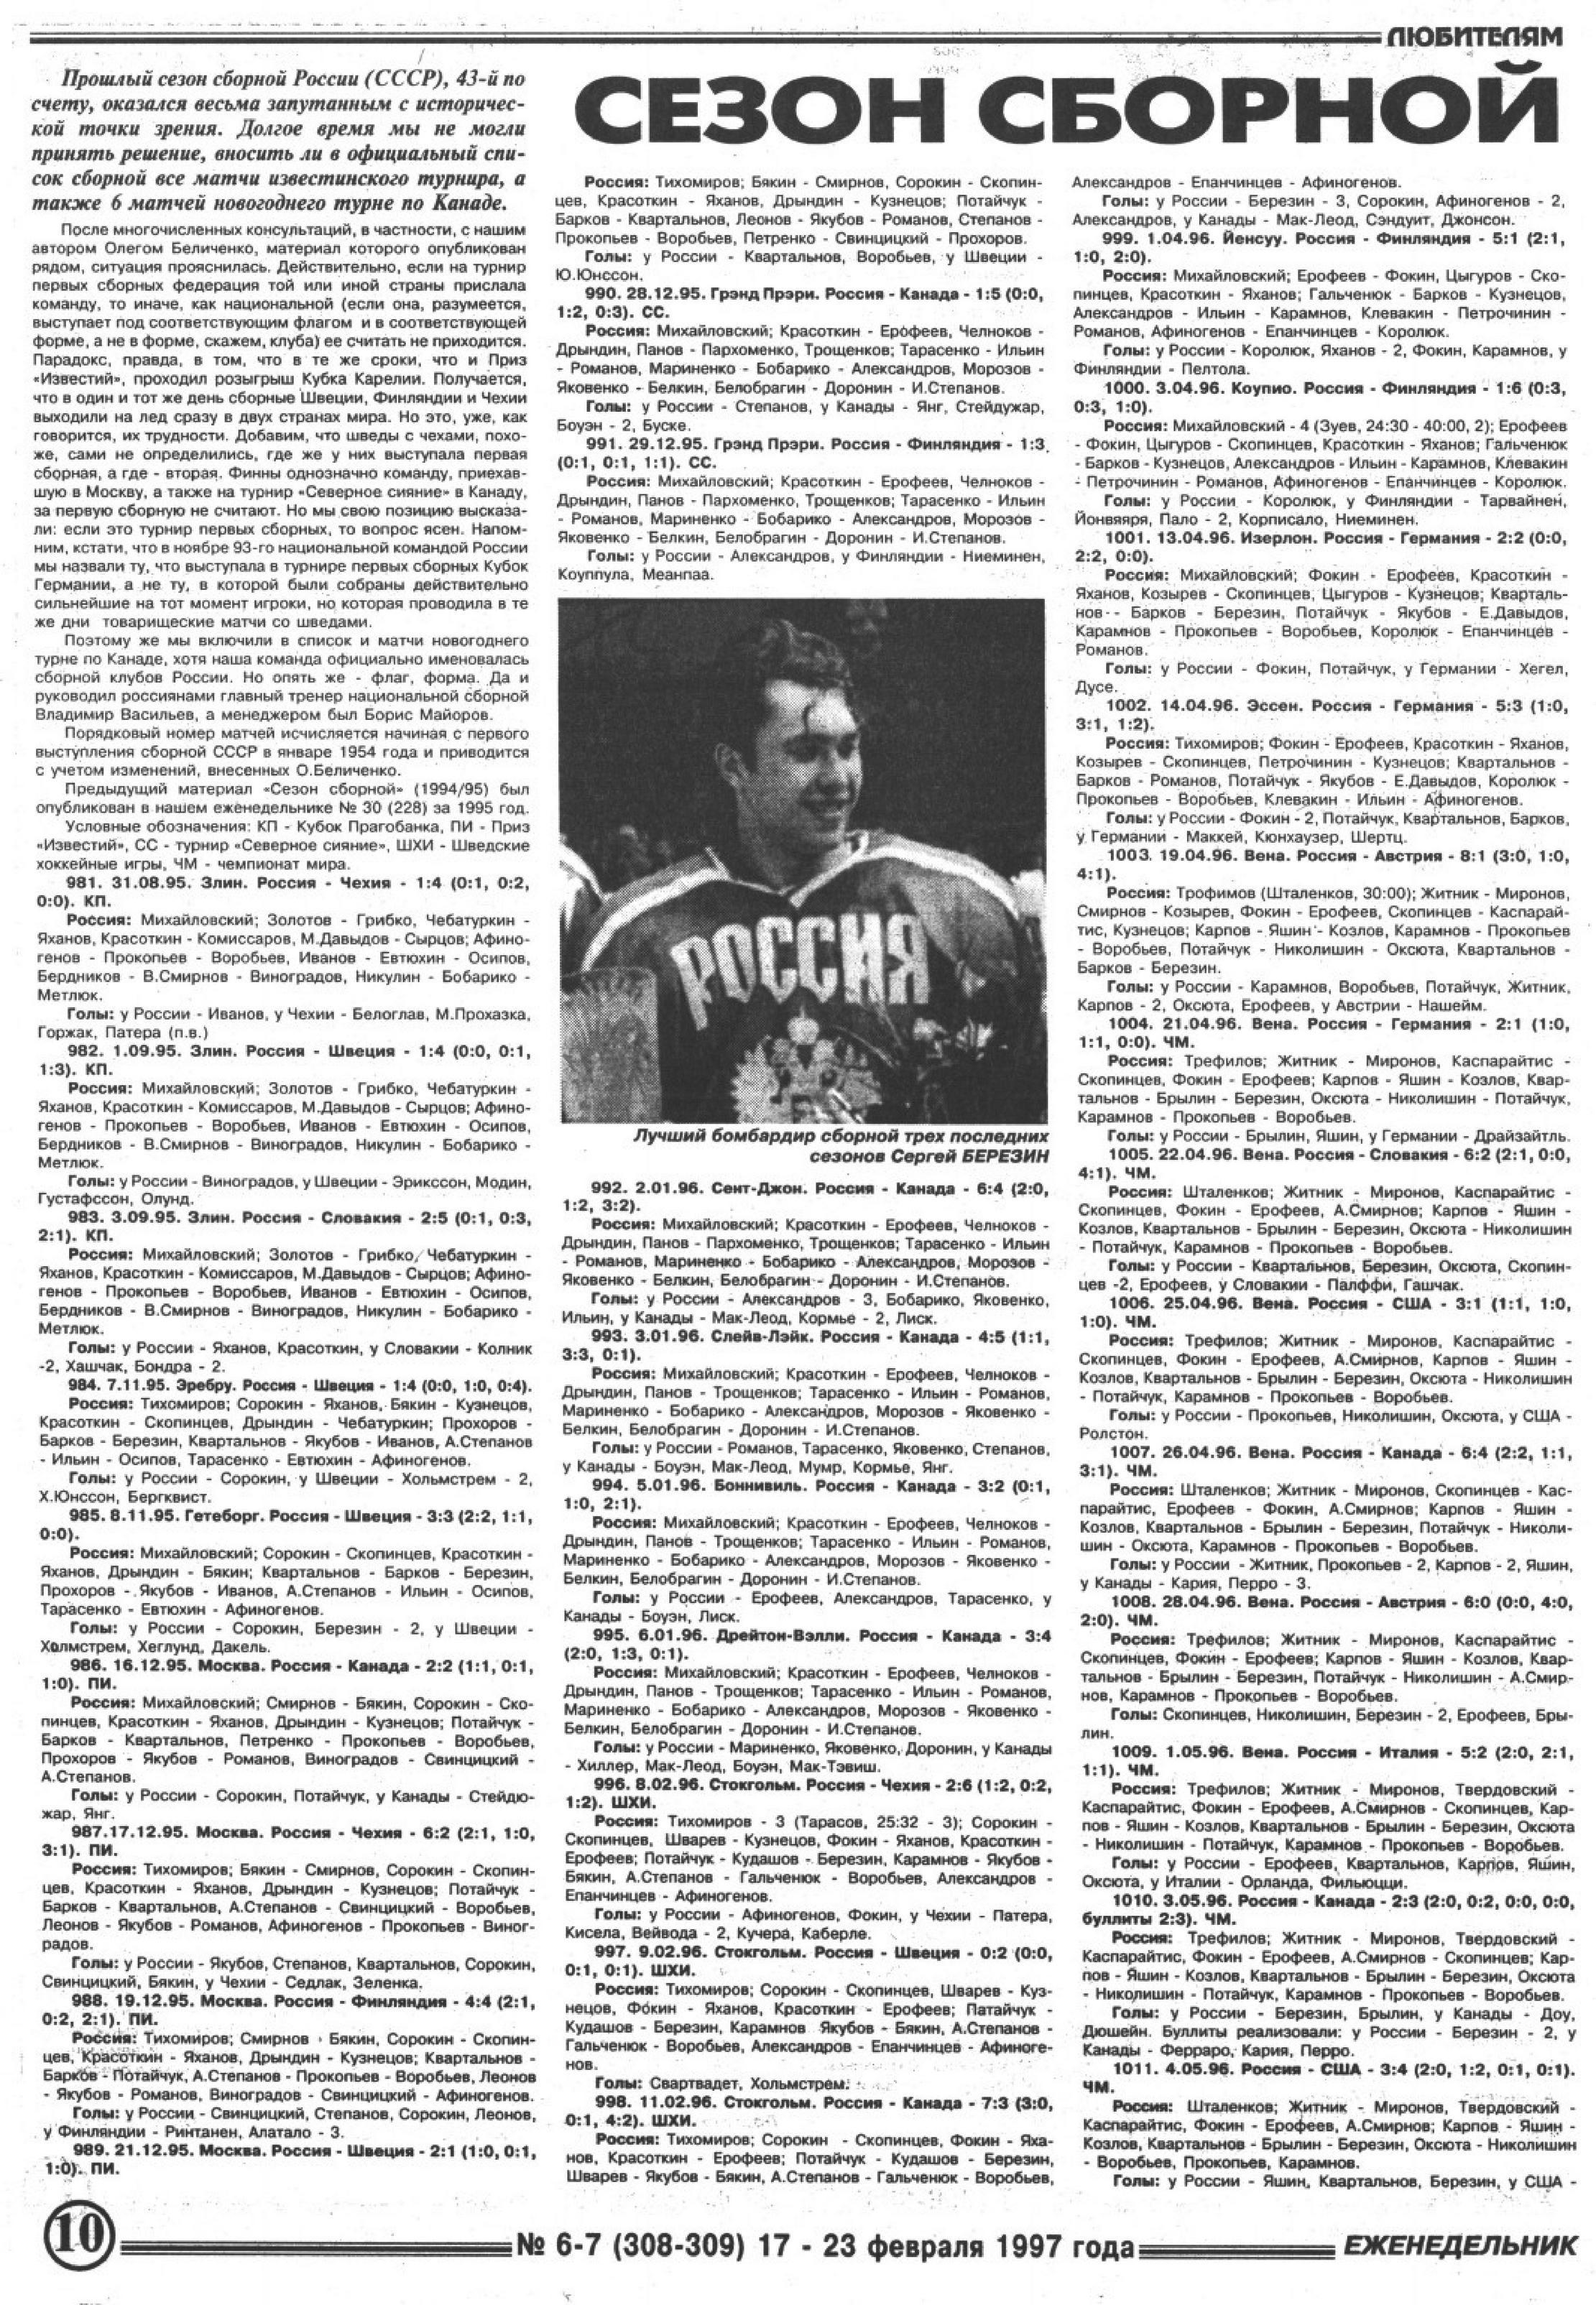 Сезон сборной 95-96(1).jpg